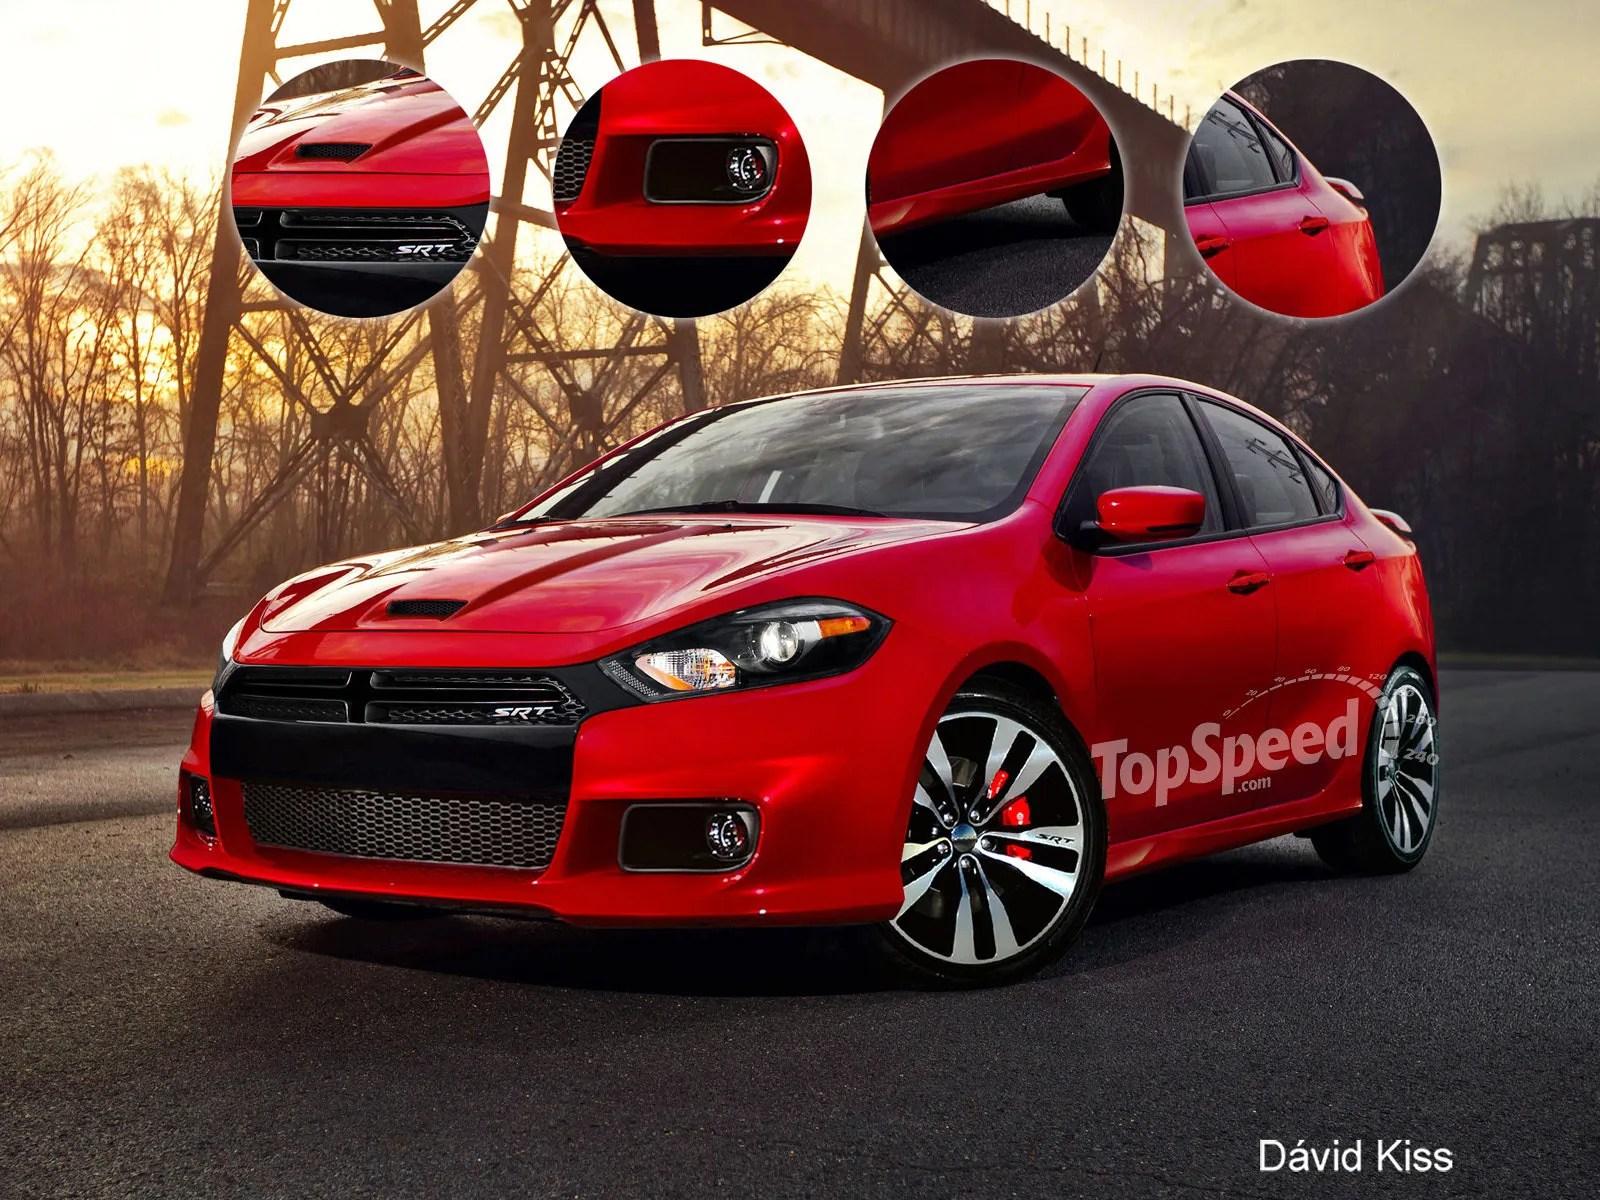 2012 Dodge Dart SRT4 Review - Top Speed